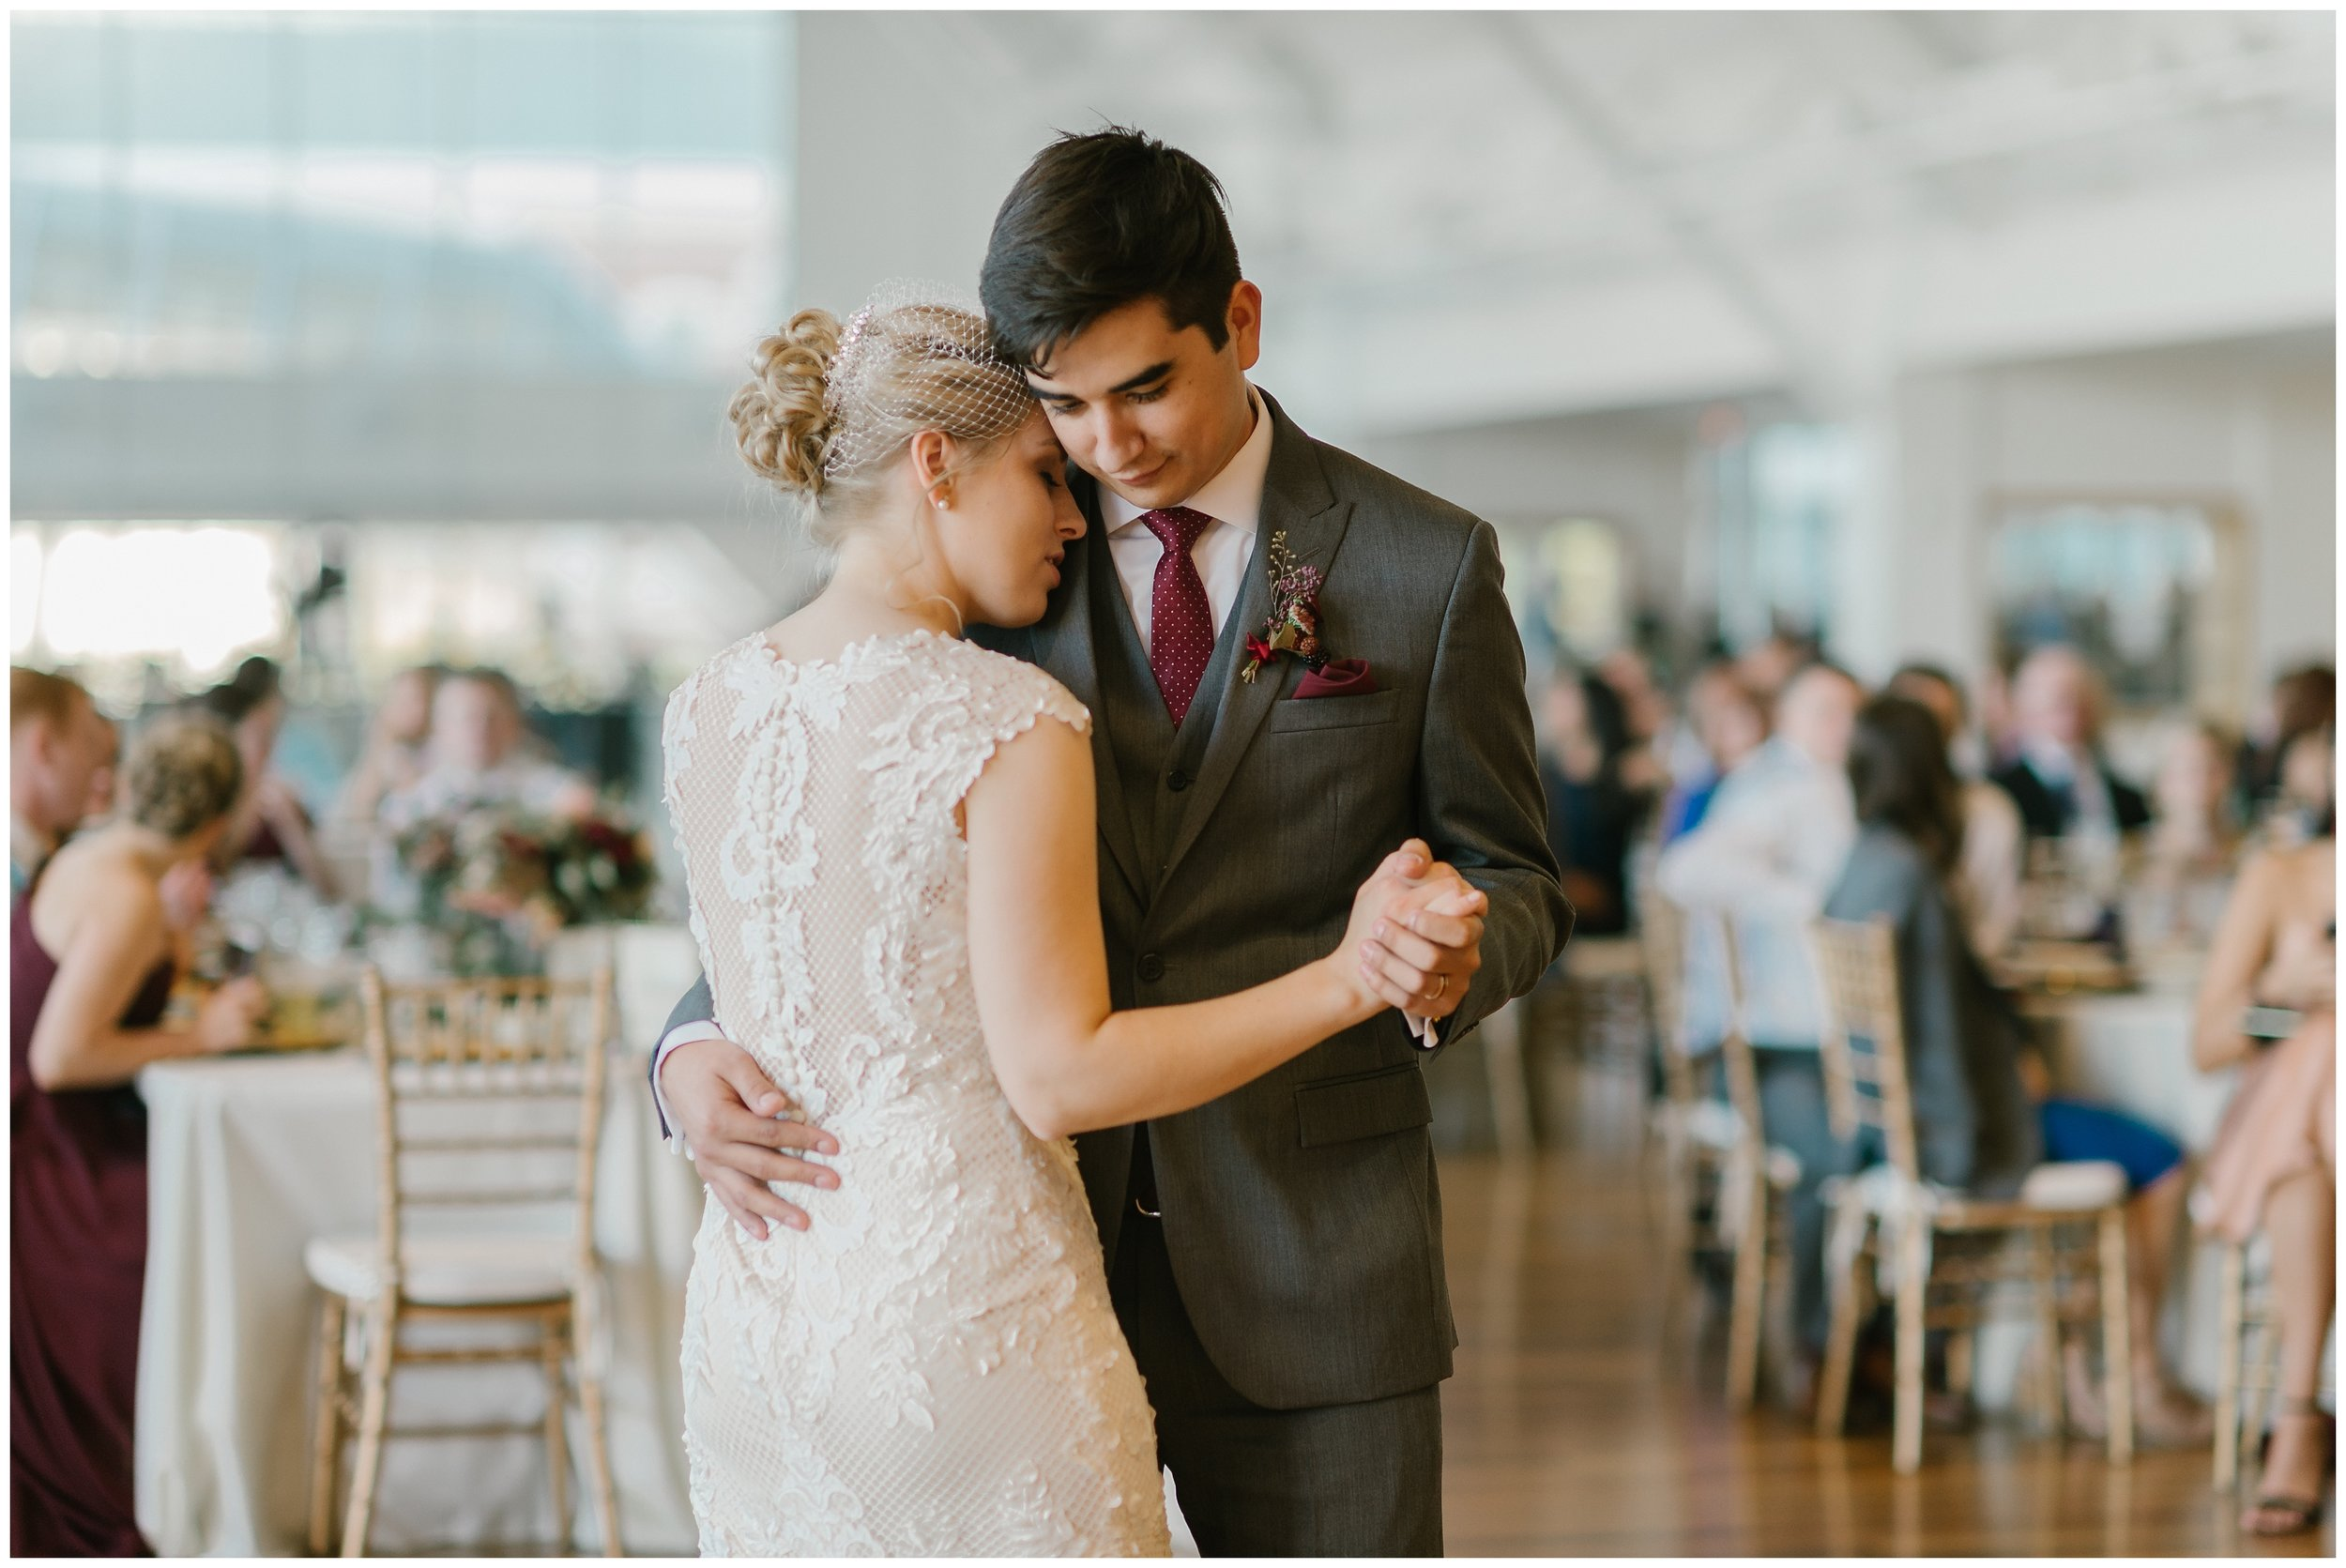 Rebecca_Shehorn_Photography_Indianapolis_Wedding_Photographer_7369.jpg